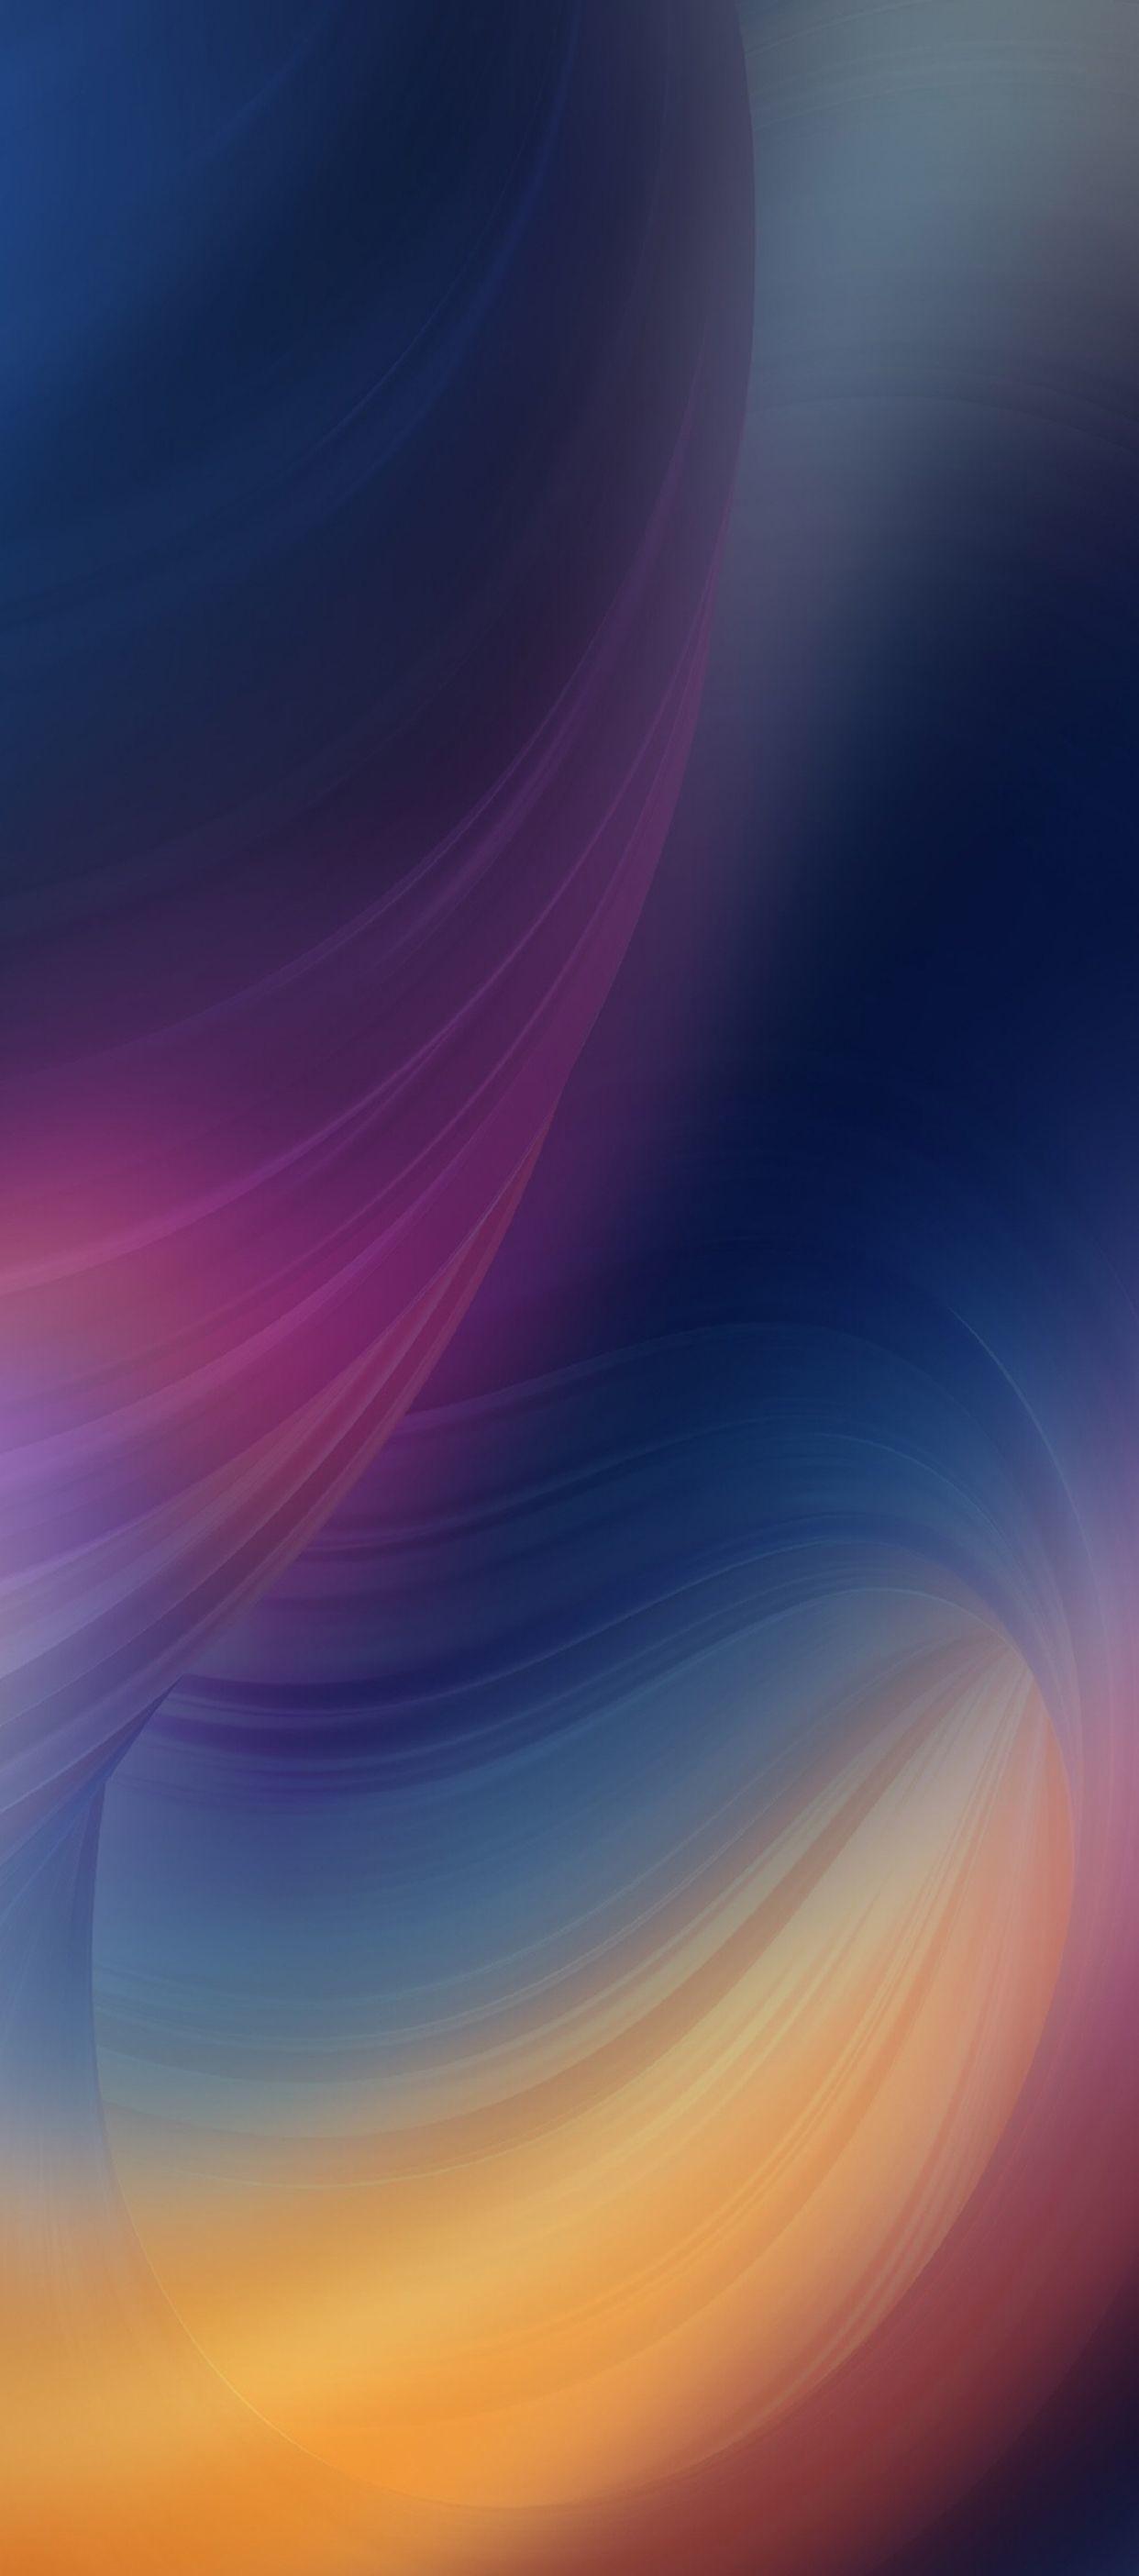 1242x2808, Ios 11, Iphone X, Purple, Blue, Clean, Simple, - Huawei Mate 10 Pro - HD Wallpaper